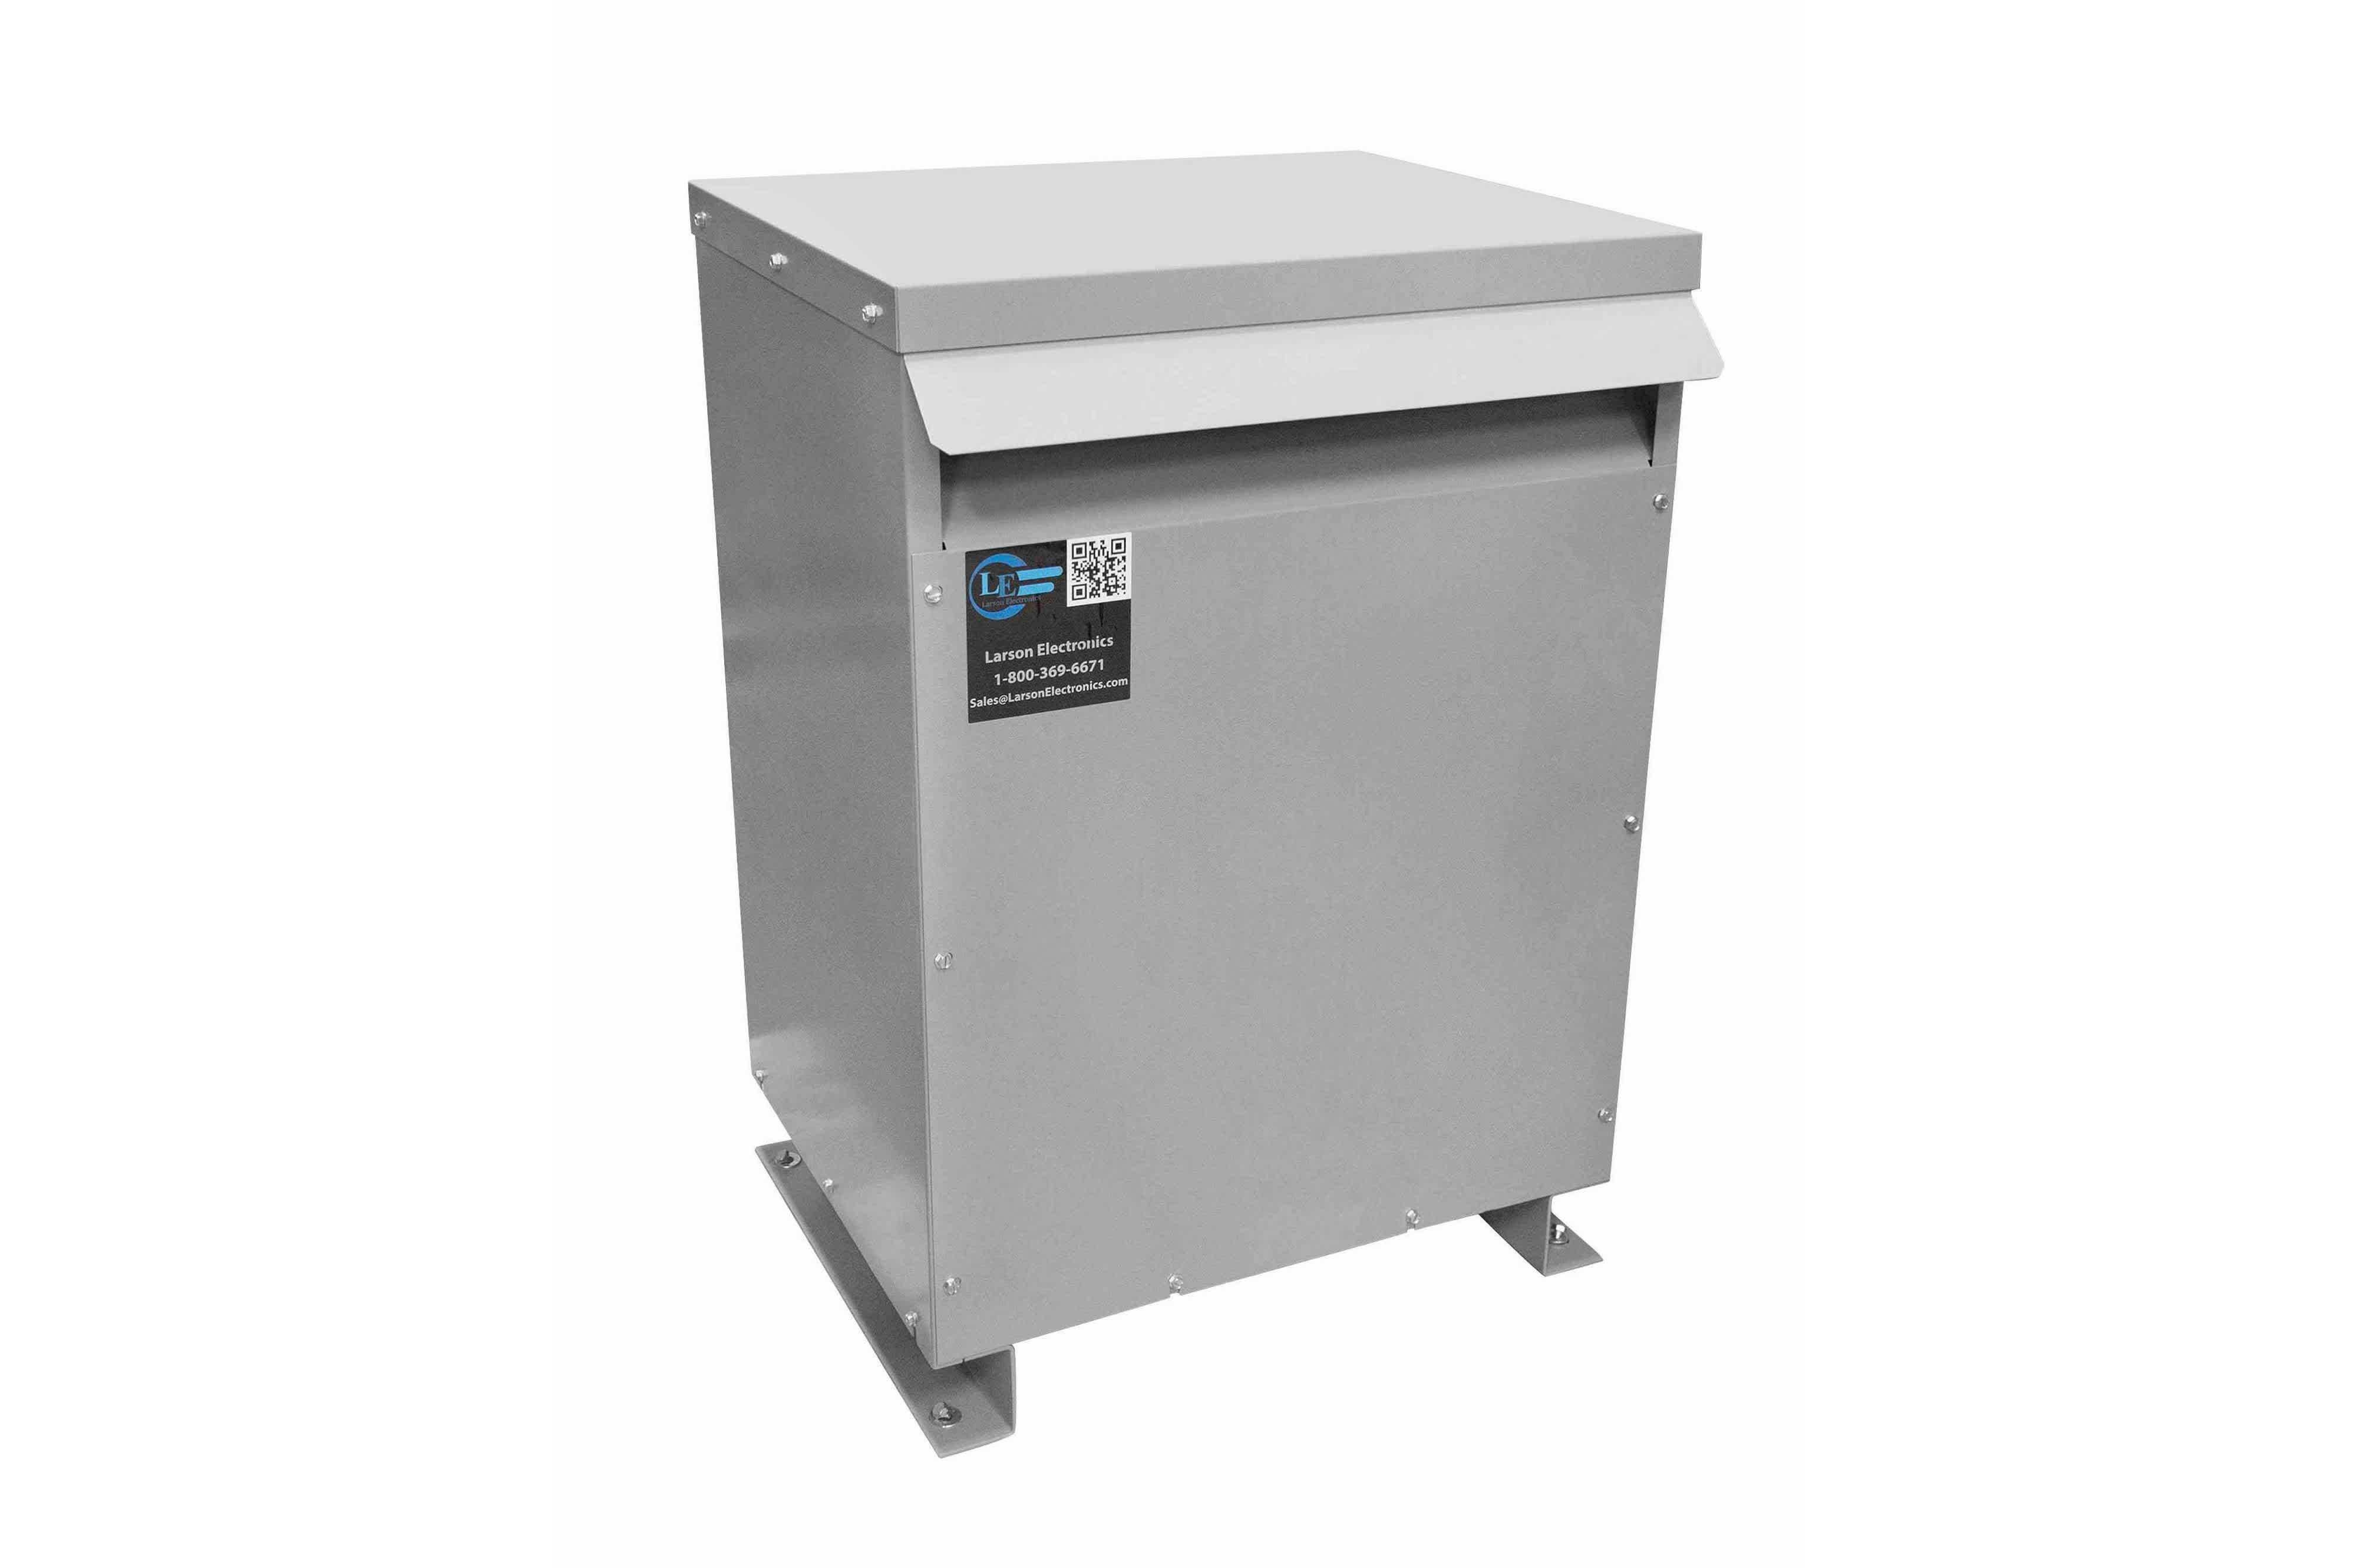 47.5 kVA 3PH Isolation Transformer, 575V Wye Primary, 400Y/231 Wye-N Secondary, N3R, Ventilated, 60 Hz